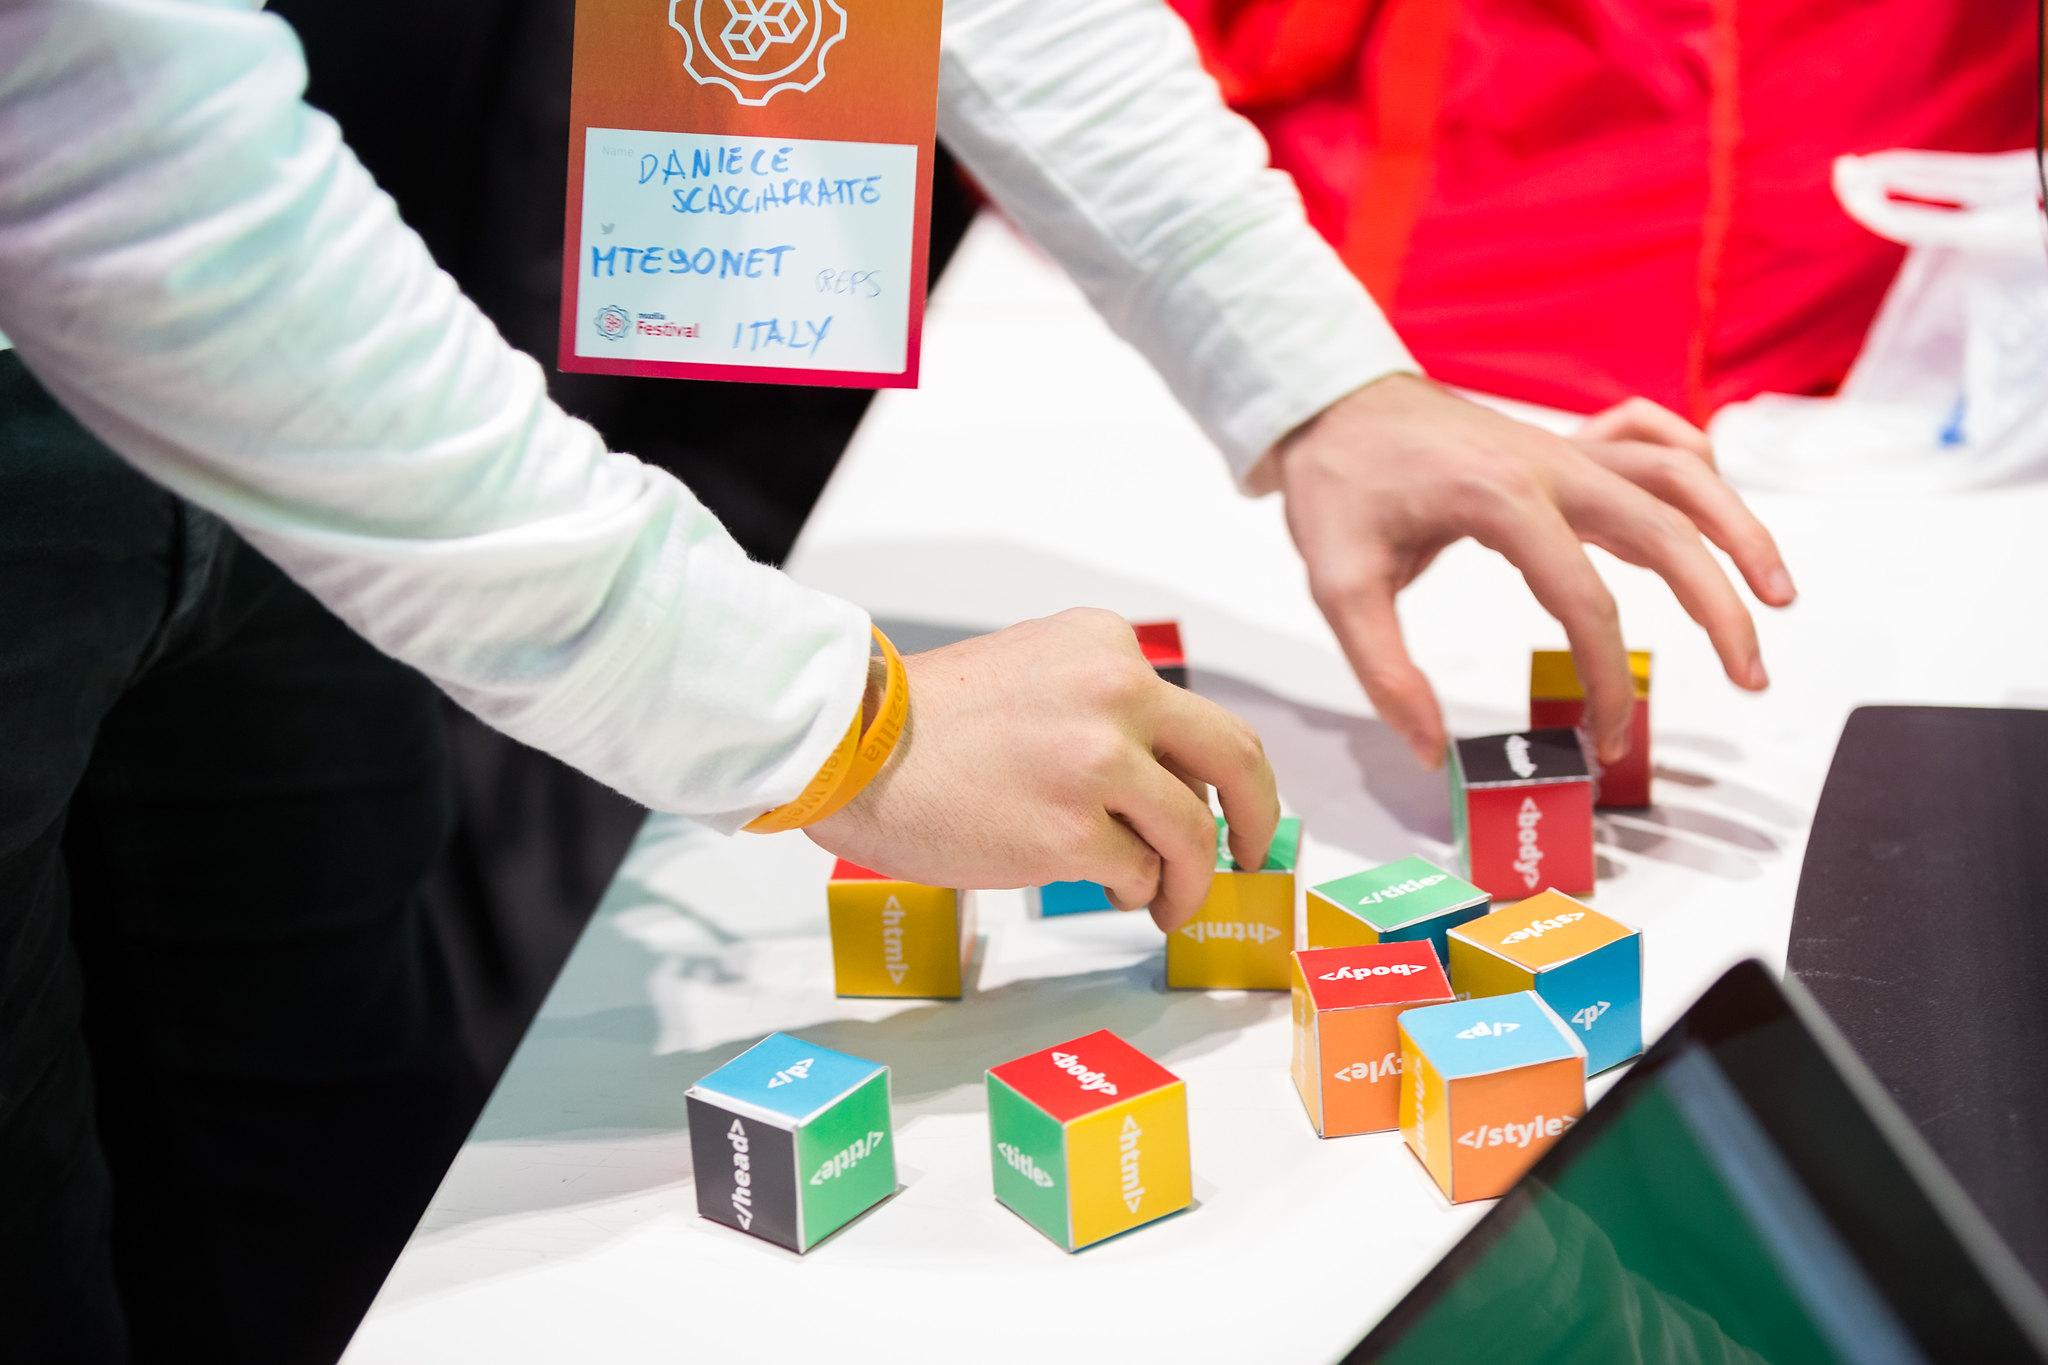 HTML Puzzle Boxes